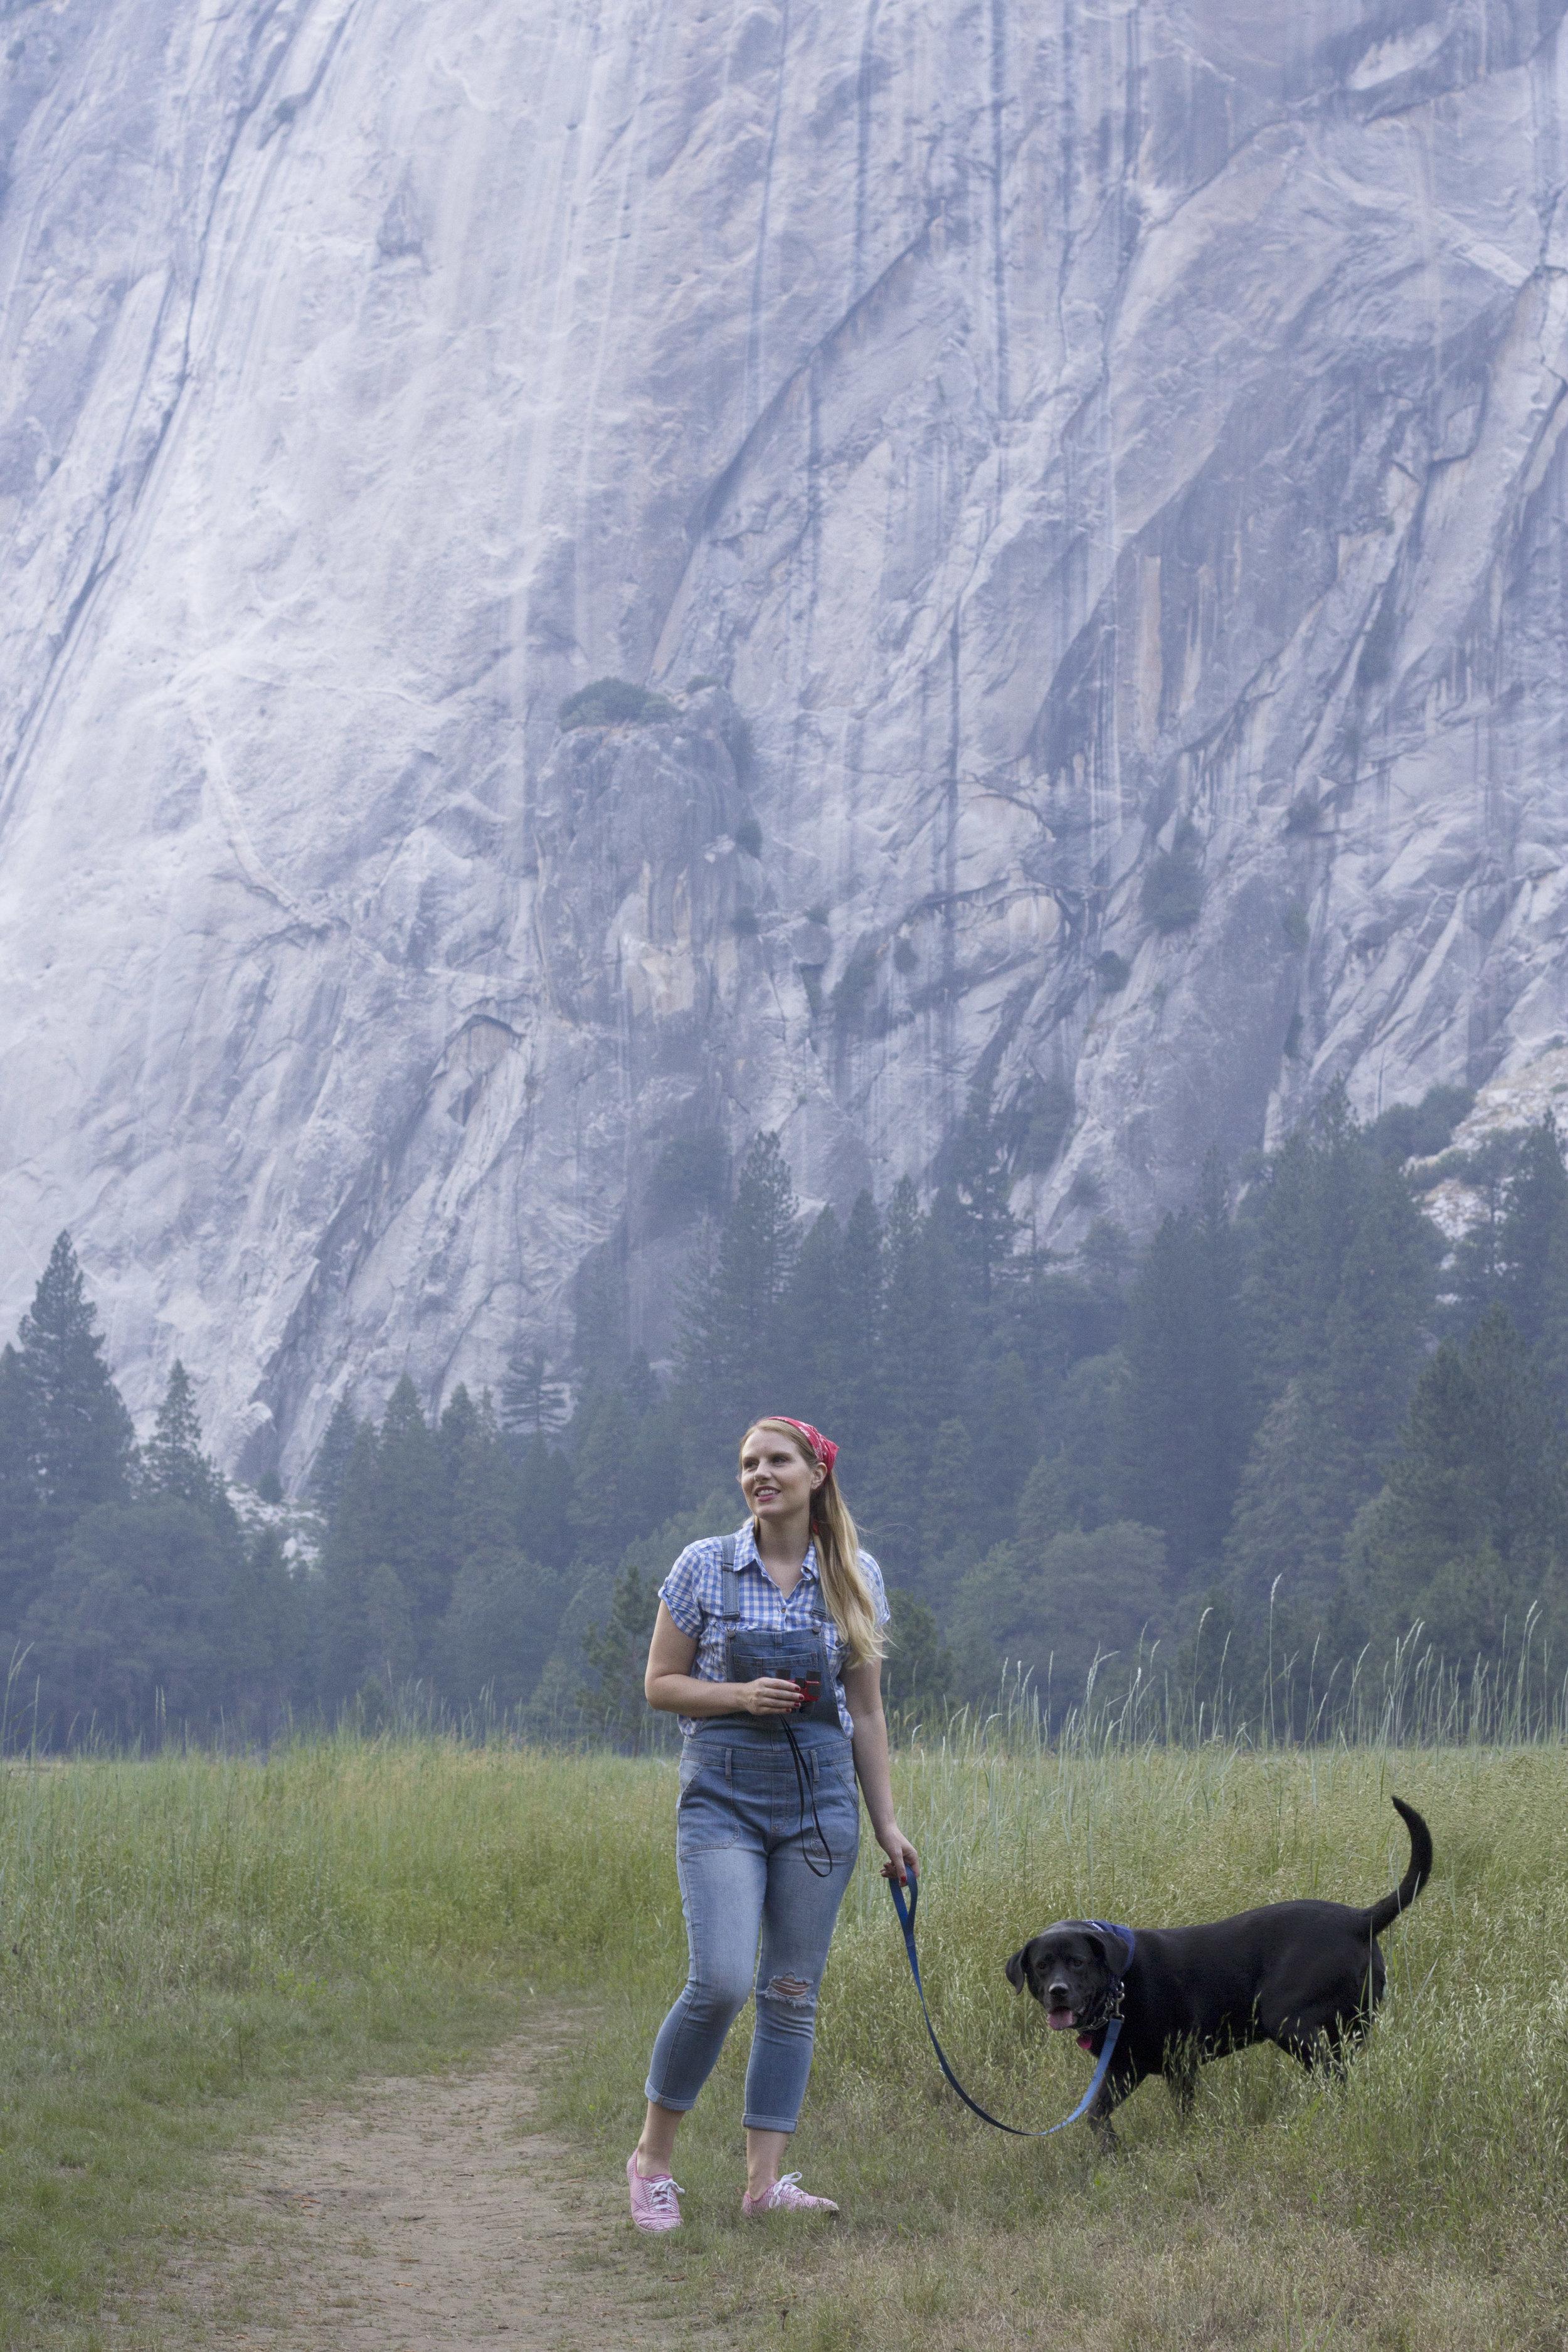 Dog Friendly Travel Guide to Yosemite -